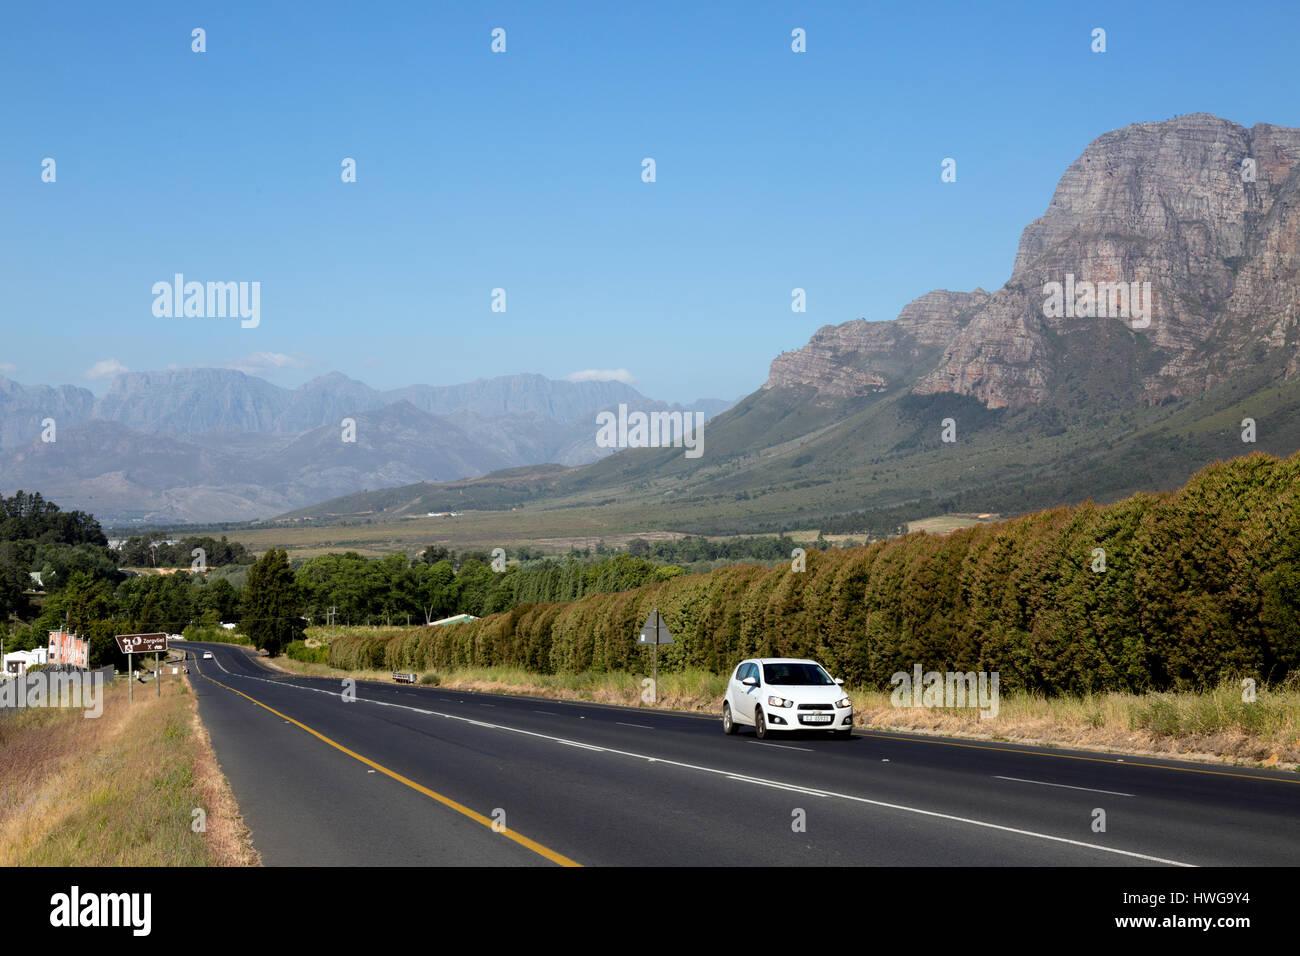 south africa western cape stellenbosch stock photos south africa